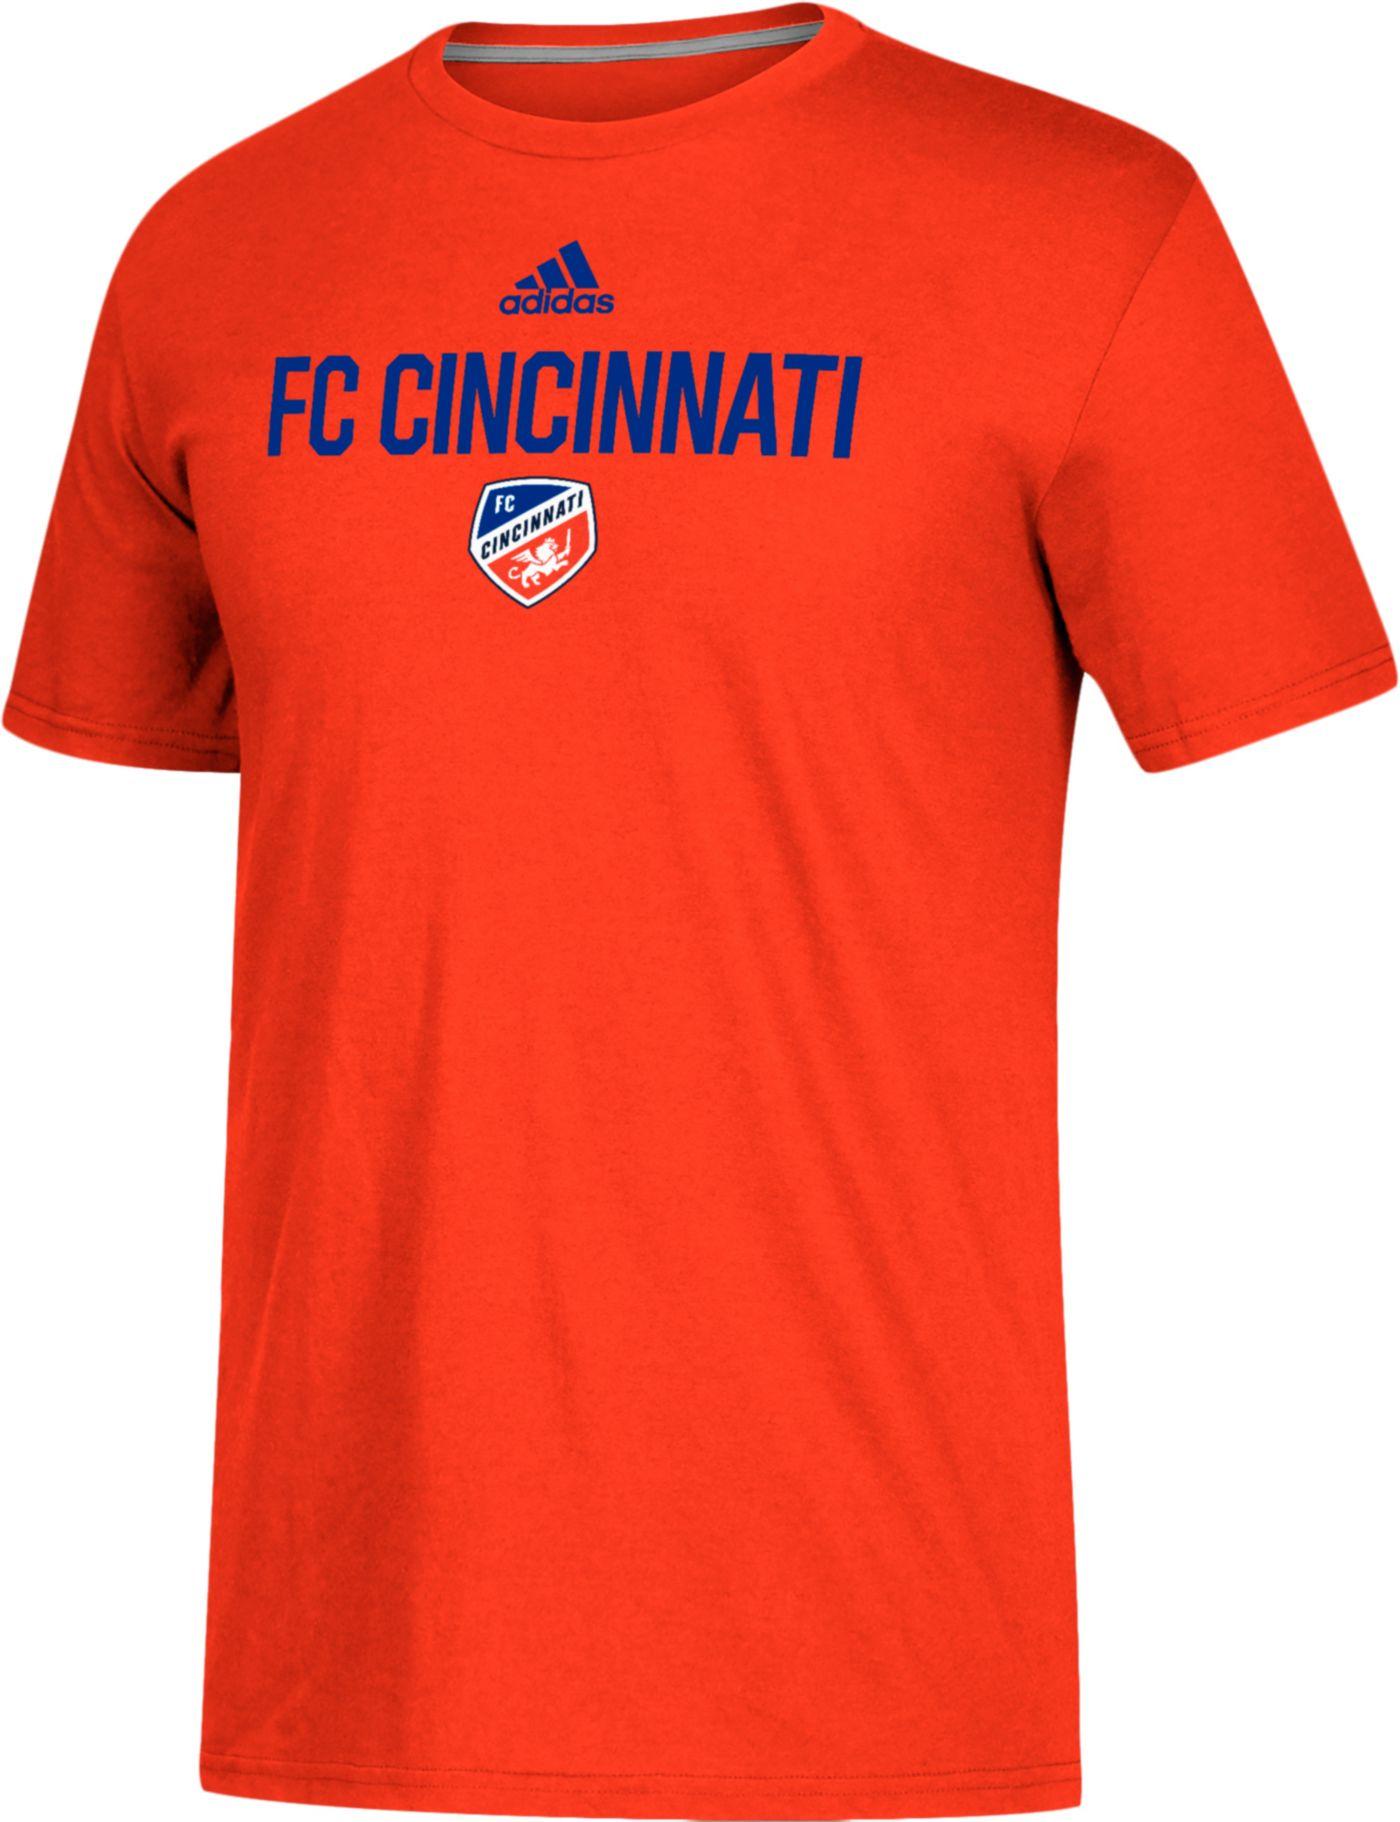 adidas Men's FC Cincinnati Logo Performance Orange T-Shirt